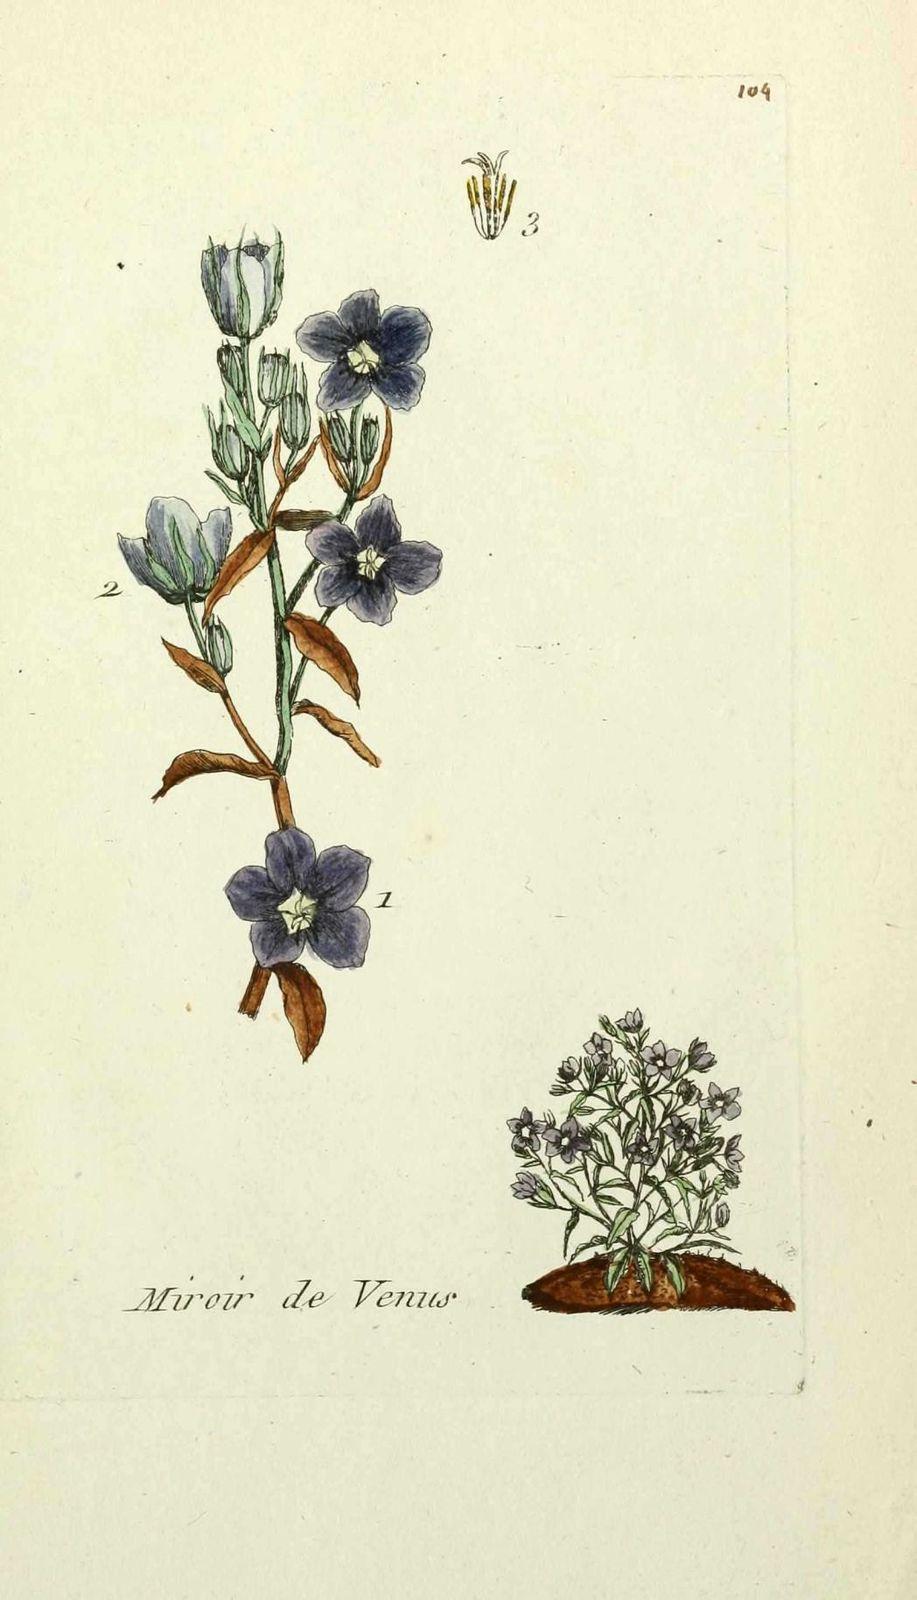 miroir de venus - campanula speculum ( doucette )